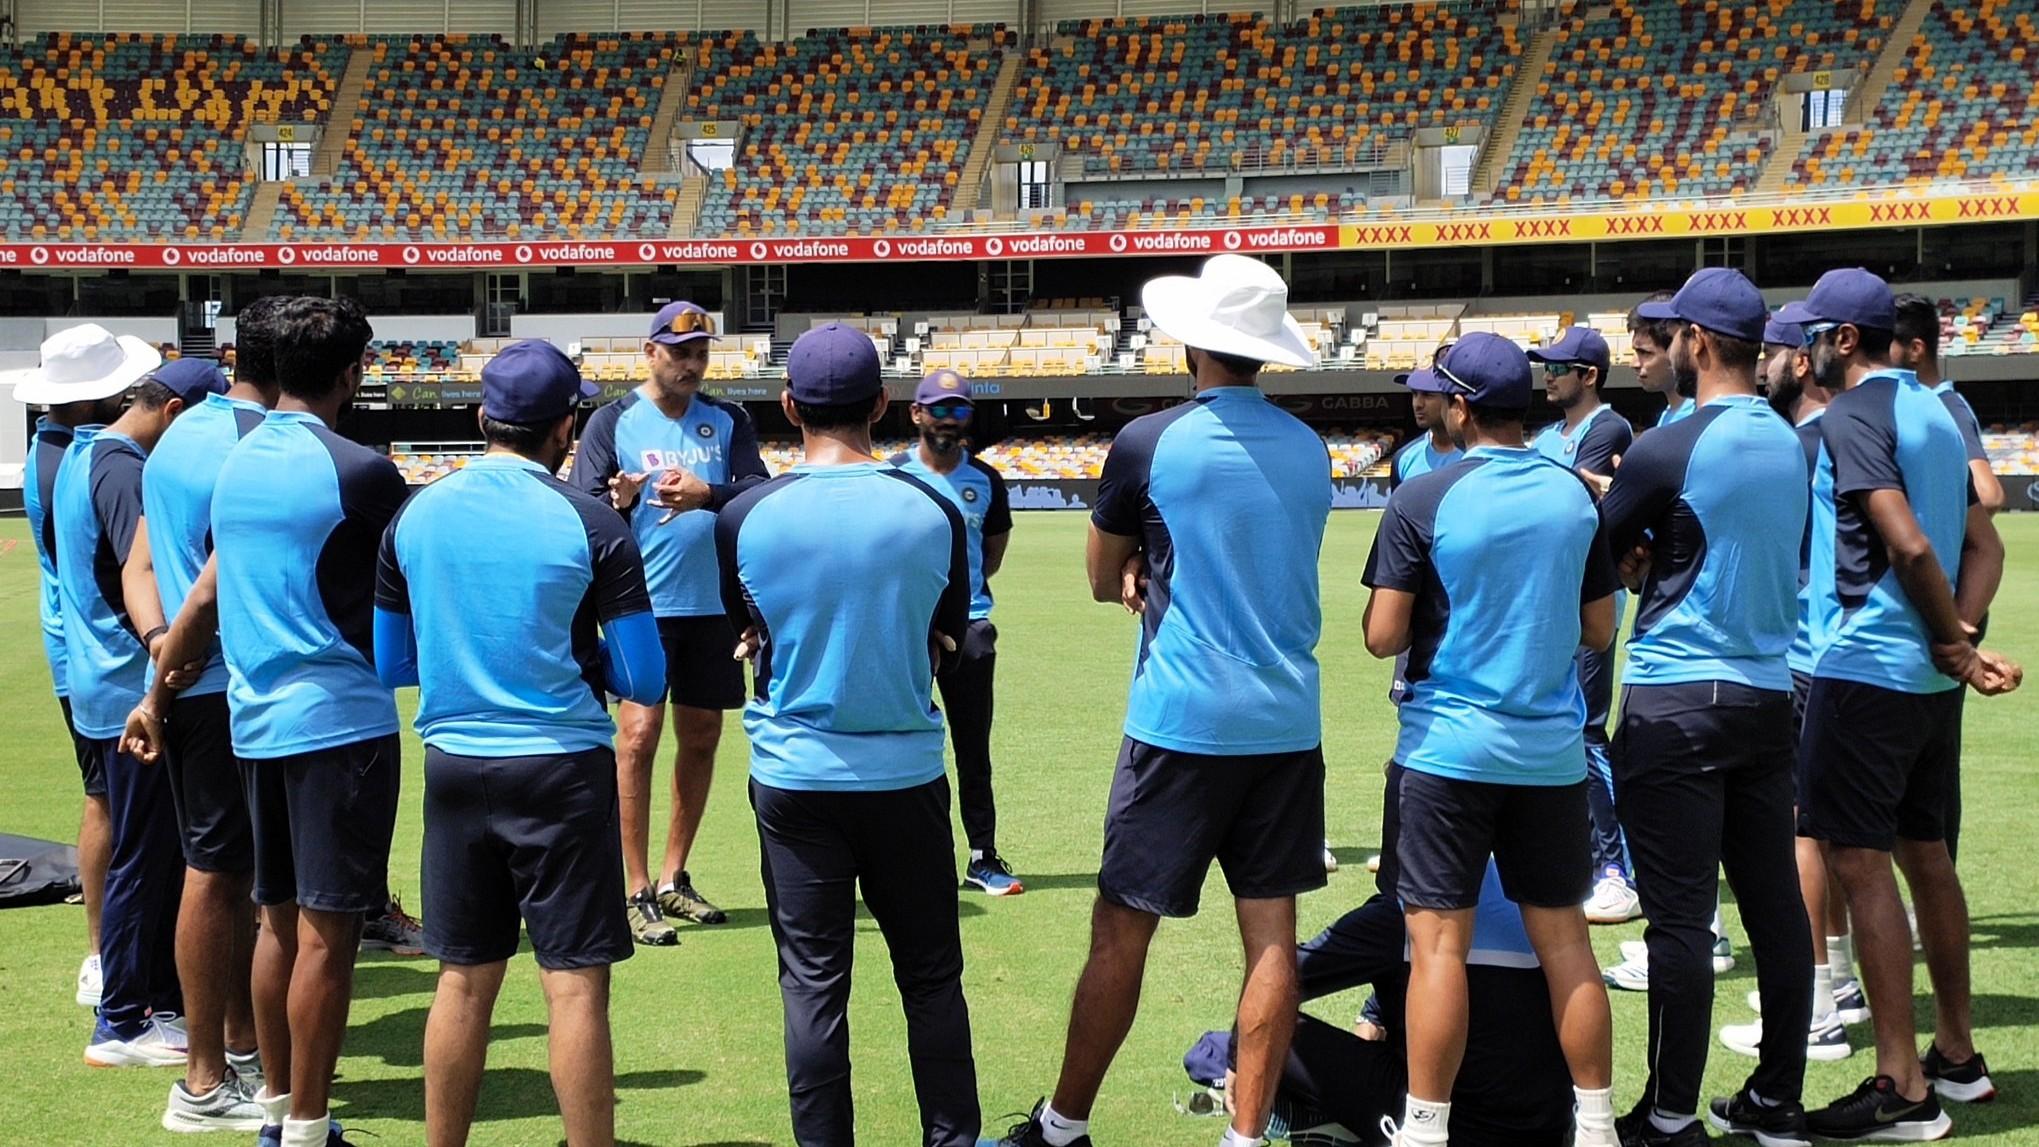 AUS v IND 2020-21: BCCI pressure leads to CA providing Team India facilities in Brisbane hotel